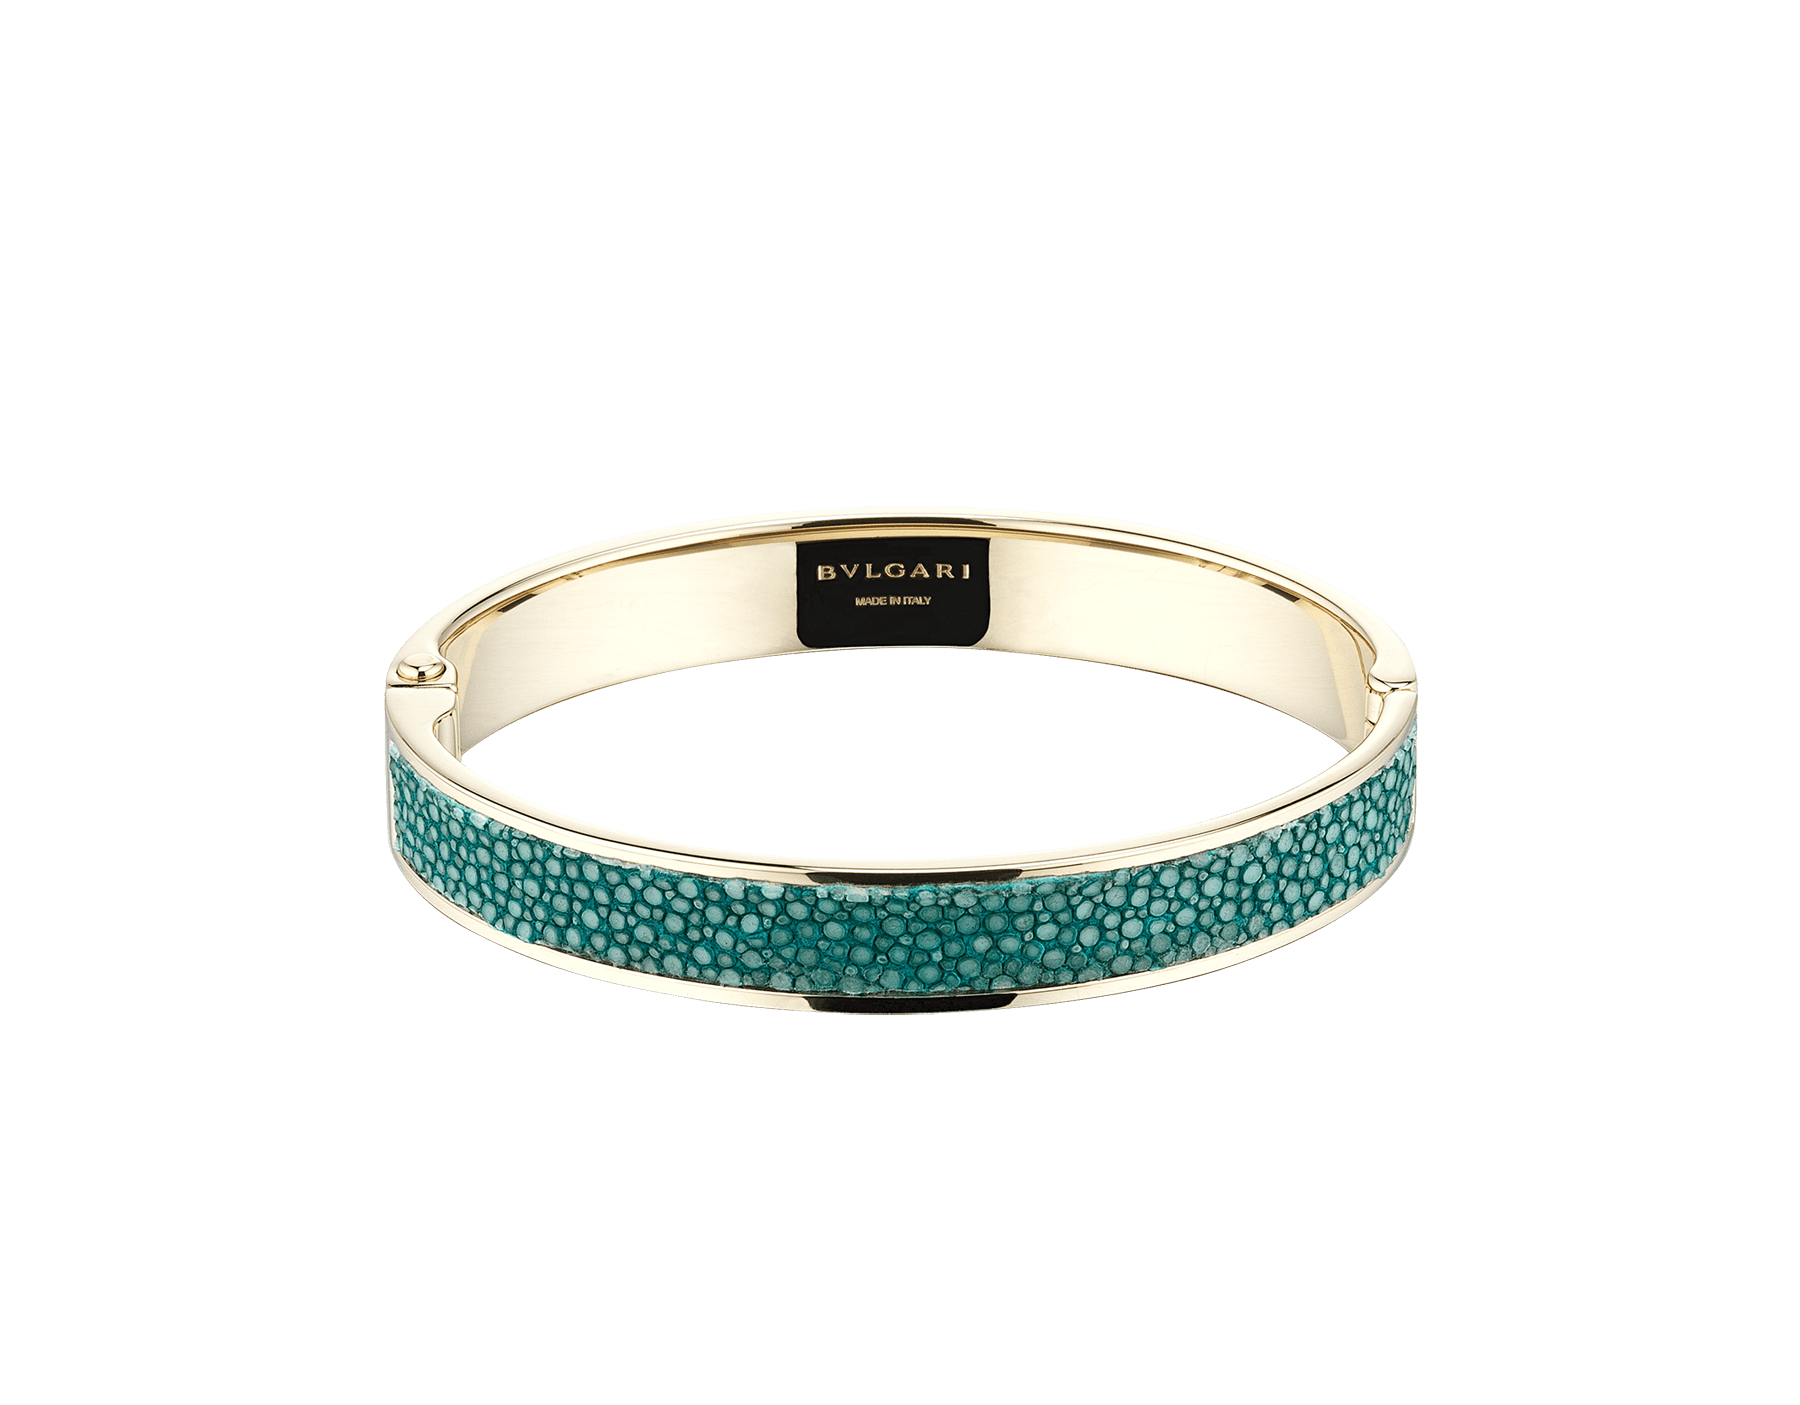 "New ""BVLGARI BVLGARI"" light gold bangle with an emerald-green galuchat skin insert and hinge bearing the BVLGARI logo. Engraved logo on the inside. HINGEBBBRACLT-G-EG image 1"